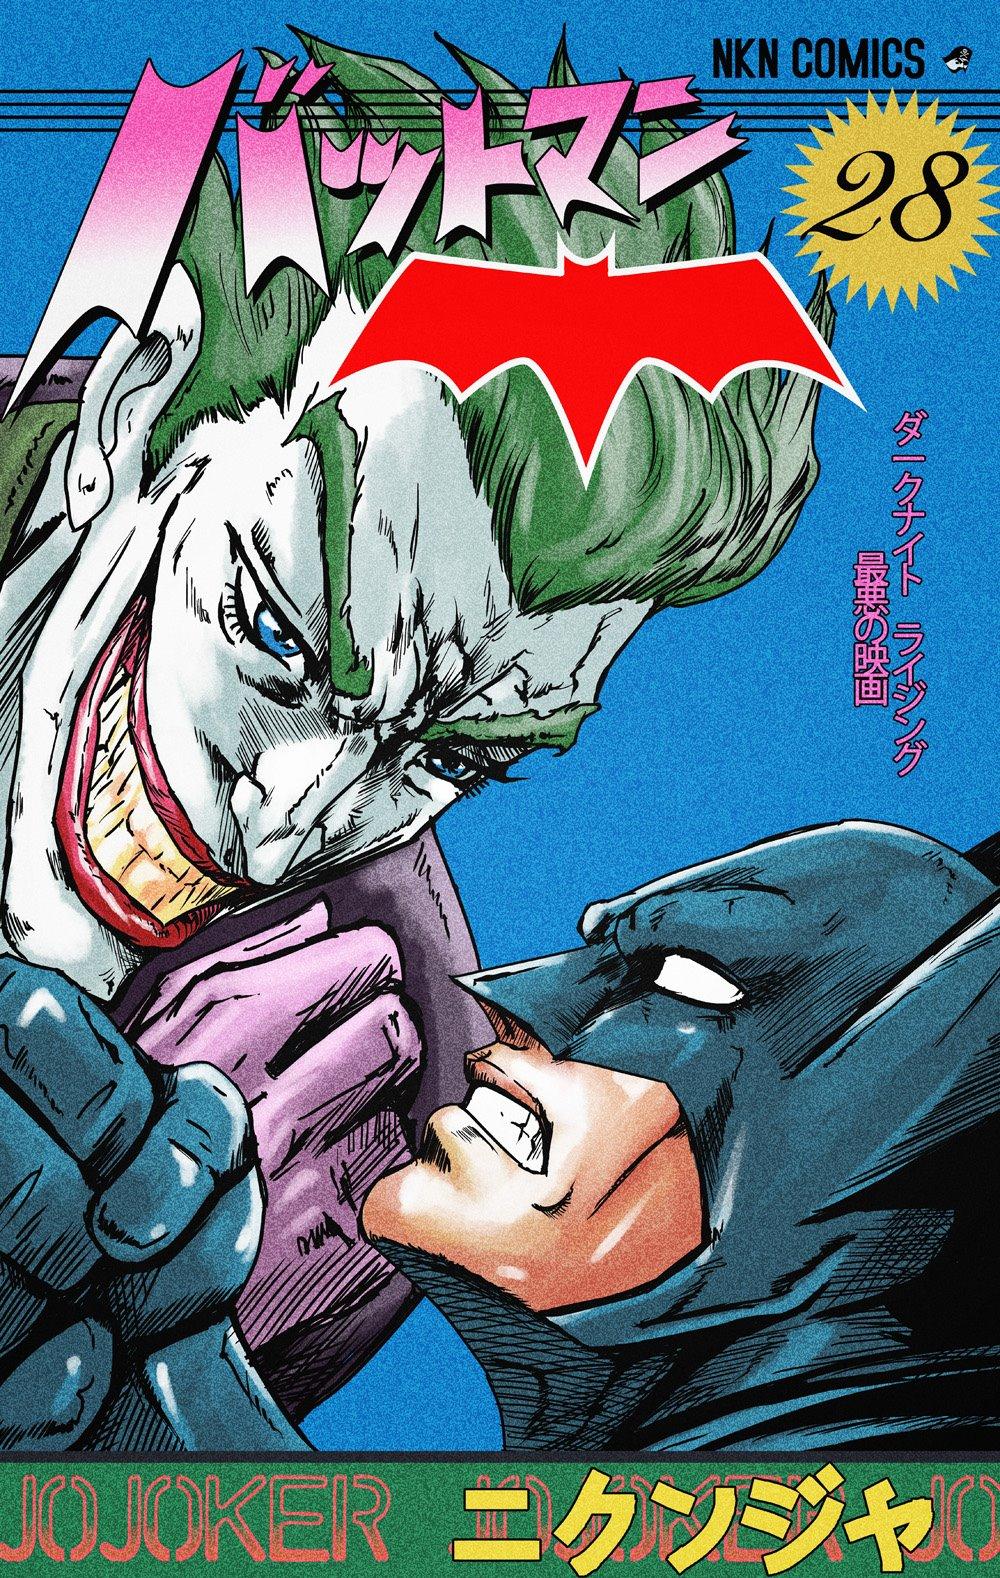 2boys batman batman_(series) blue_eyes clenched_hand clenched_teeth commentary dc_comics evil_grin evil_smile green_hair grin highres jojo_no_kimyou_na_bouken lipstick makeup male_focus multiple_boys nikunja parody red_lipstick smile stardust_crusaders superhero teeth the_joker translated